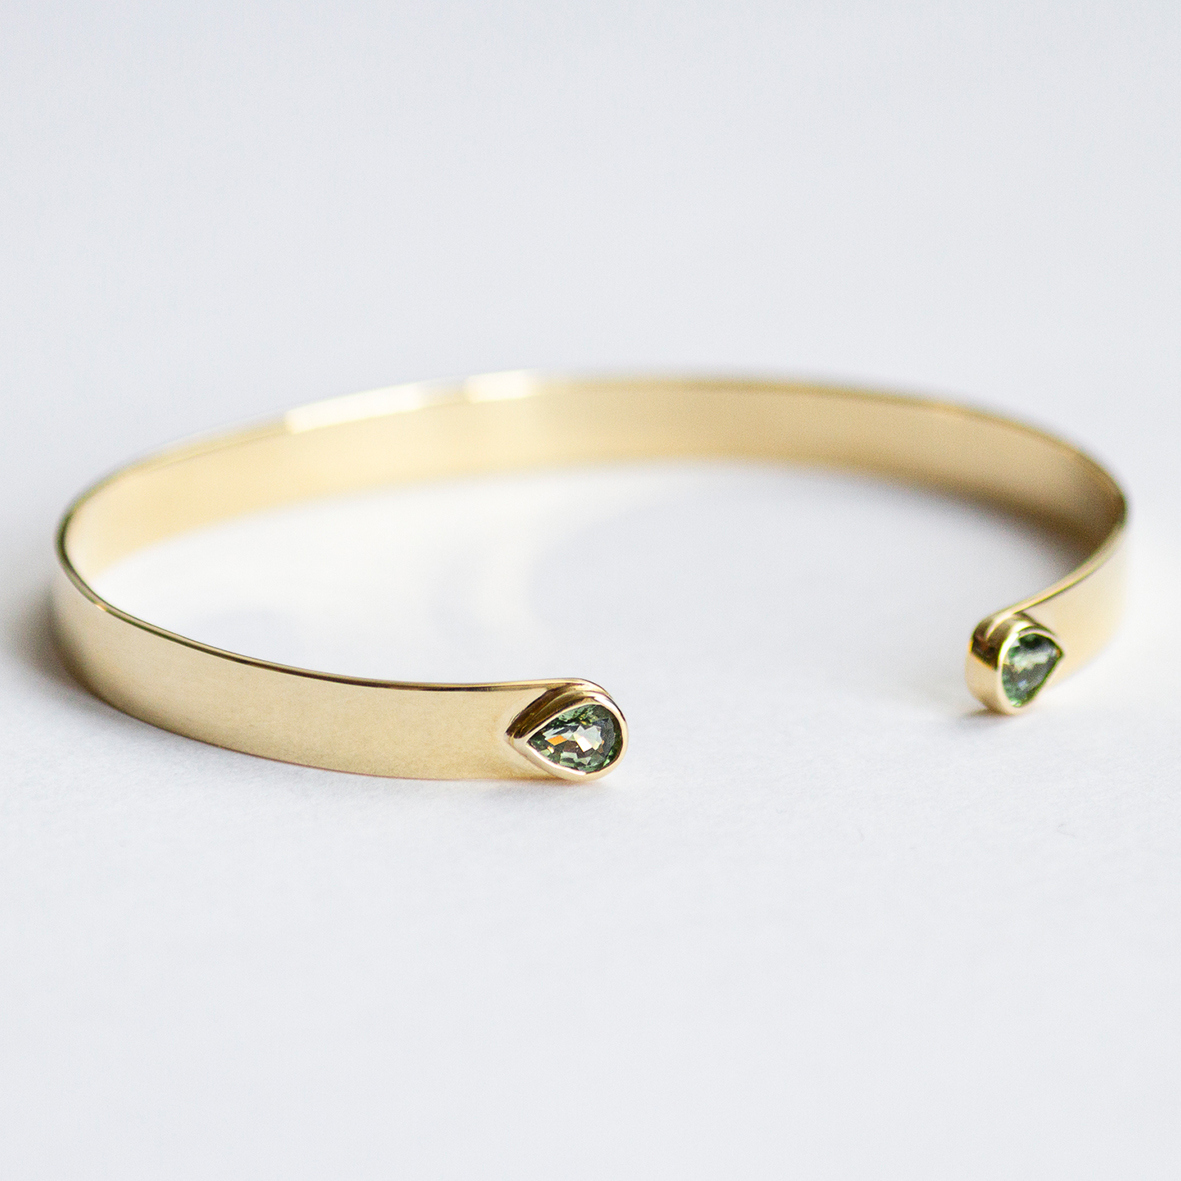 3. OONA_lotus_principal_flat sapphire bracelet